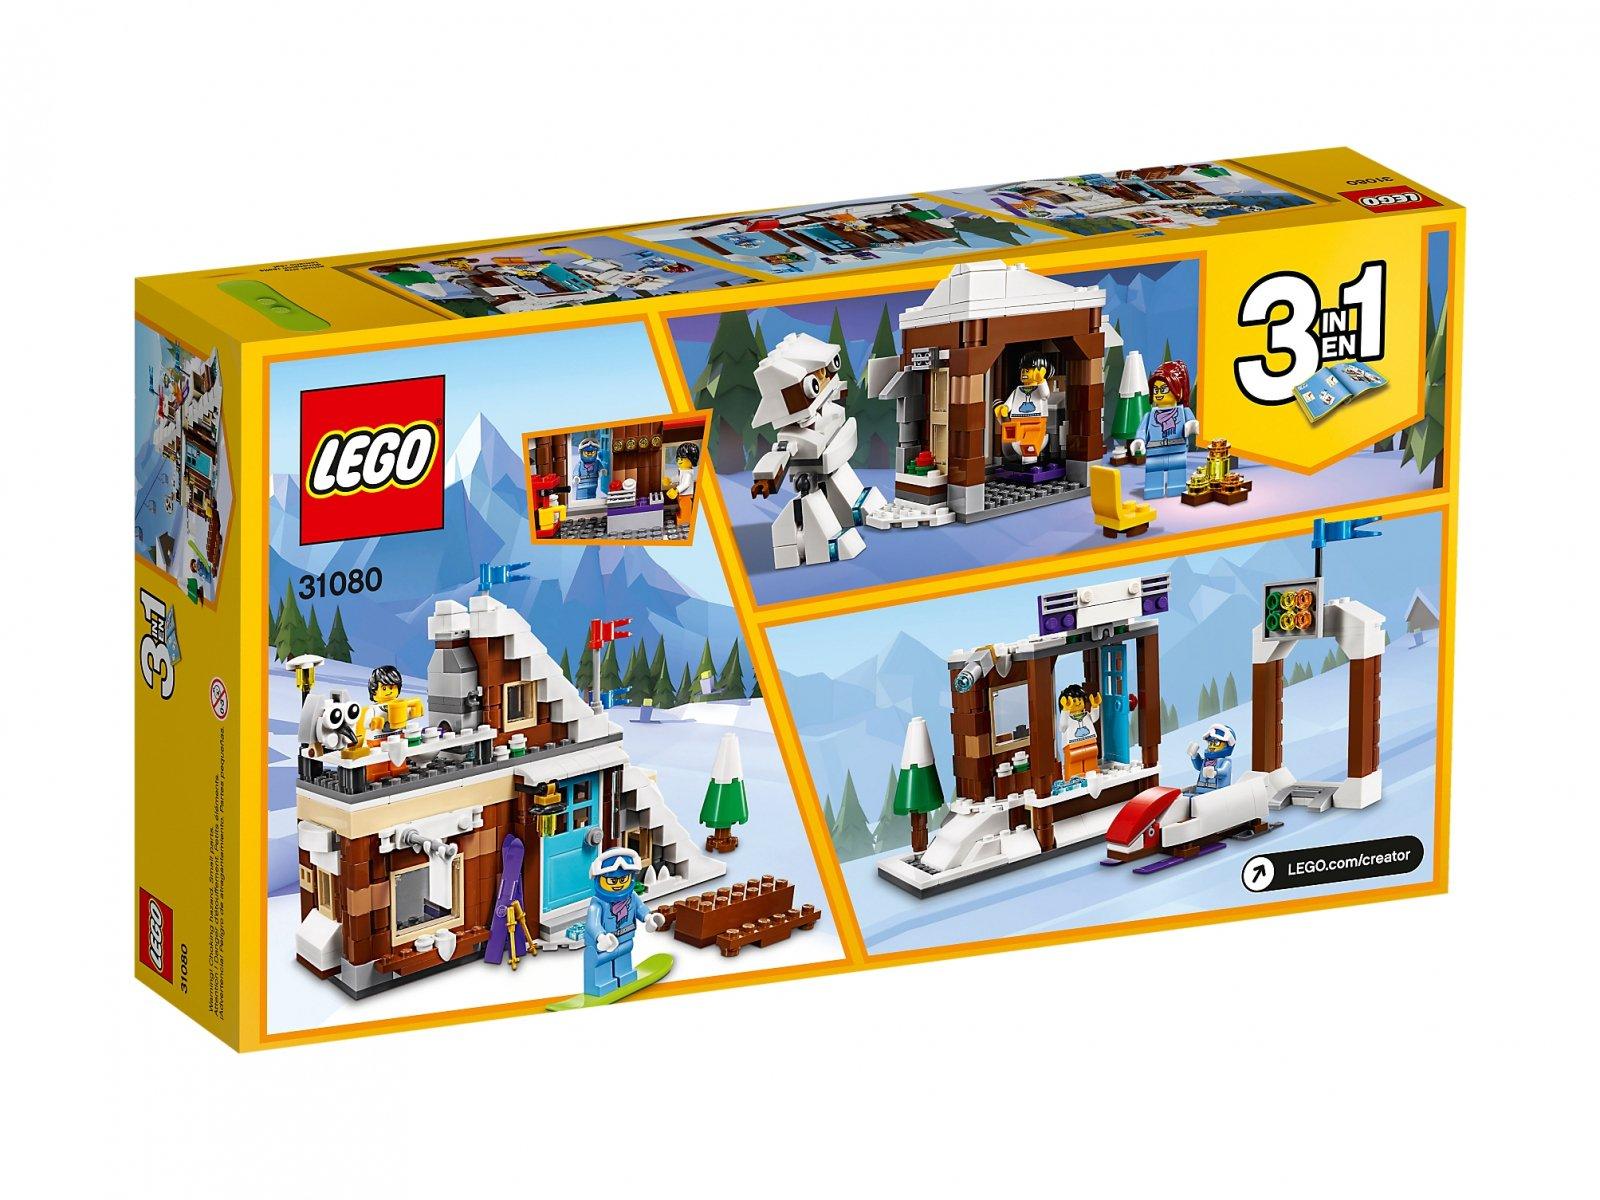 LEGO 31080 Ferie zimowe